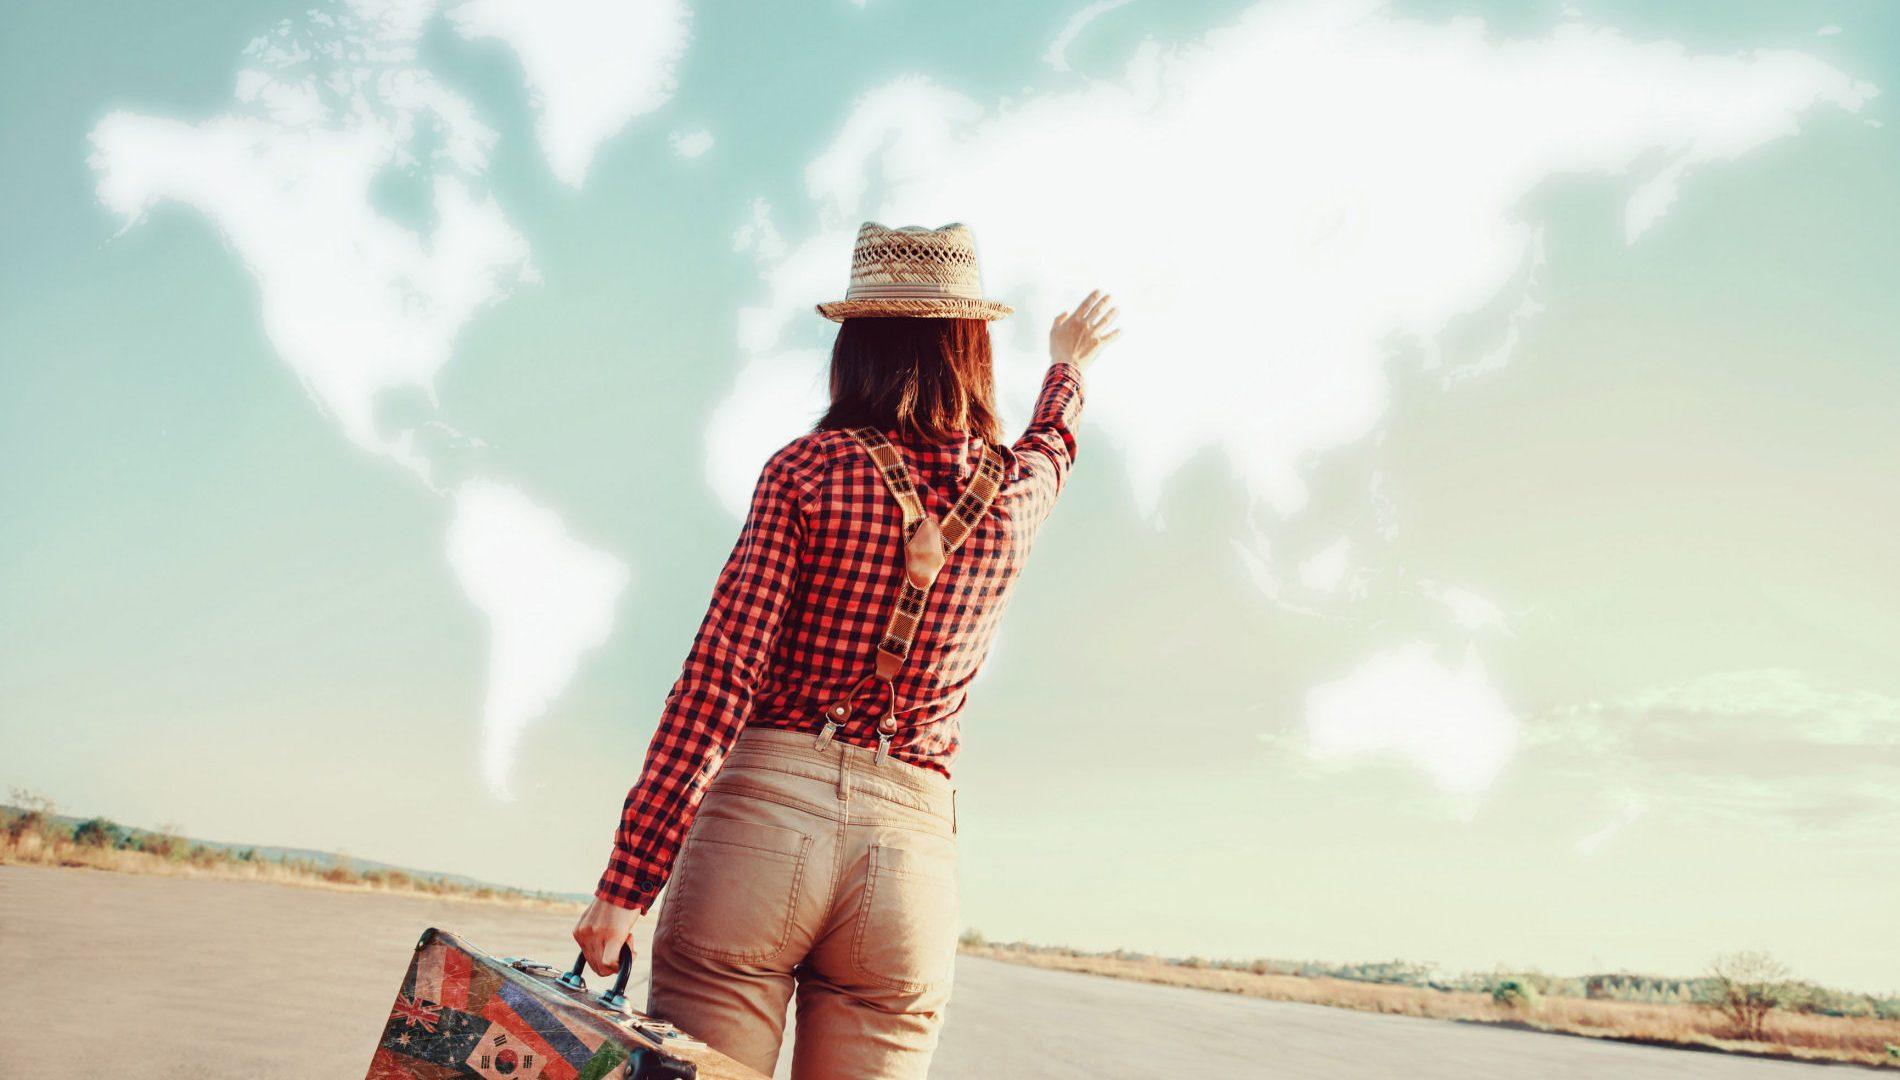 luigia viaggiare